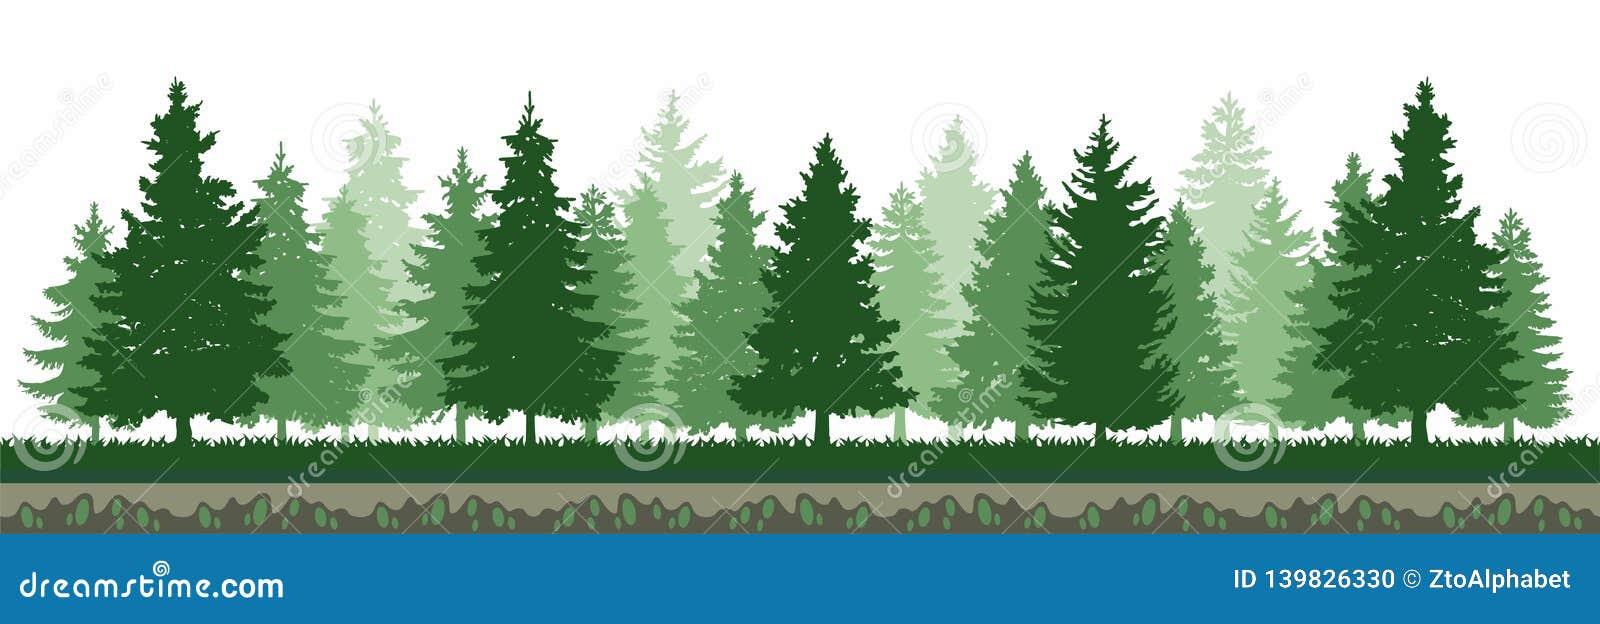 Árbol de pino verde Forest Environment